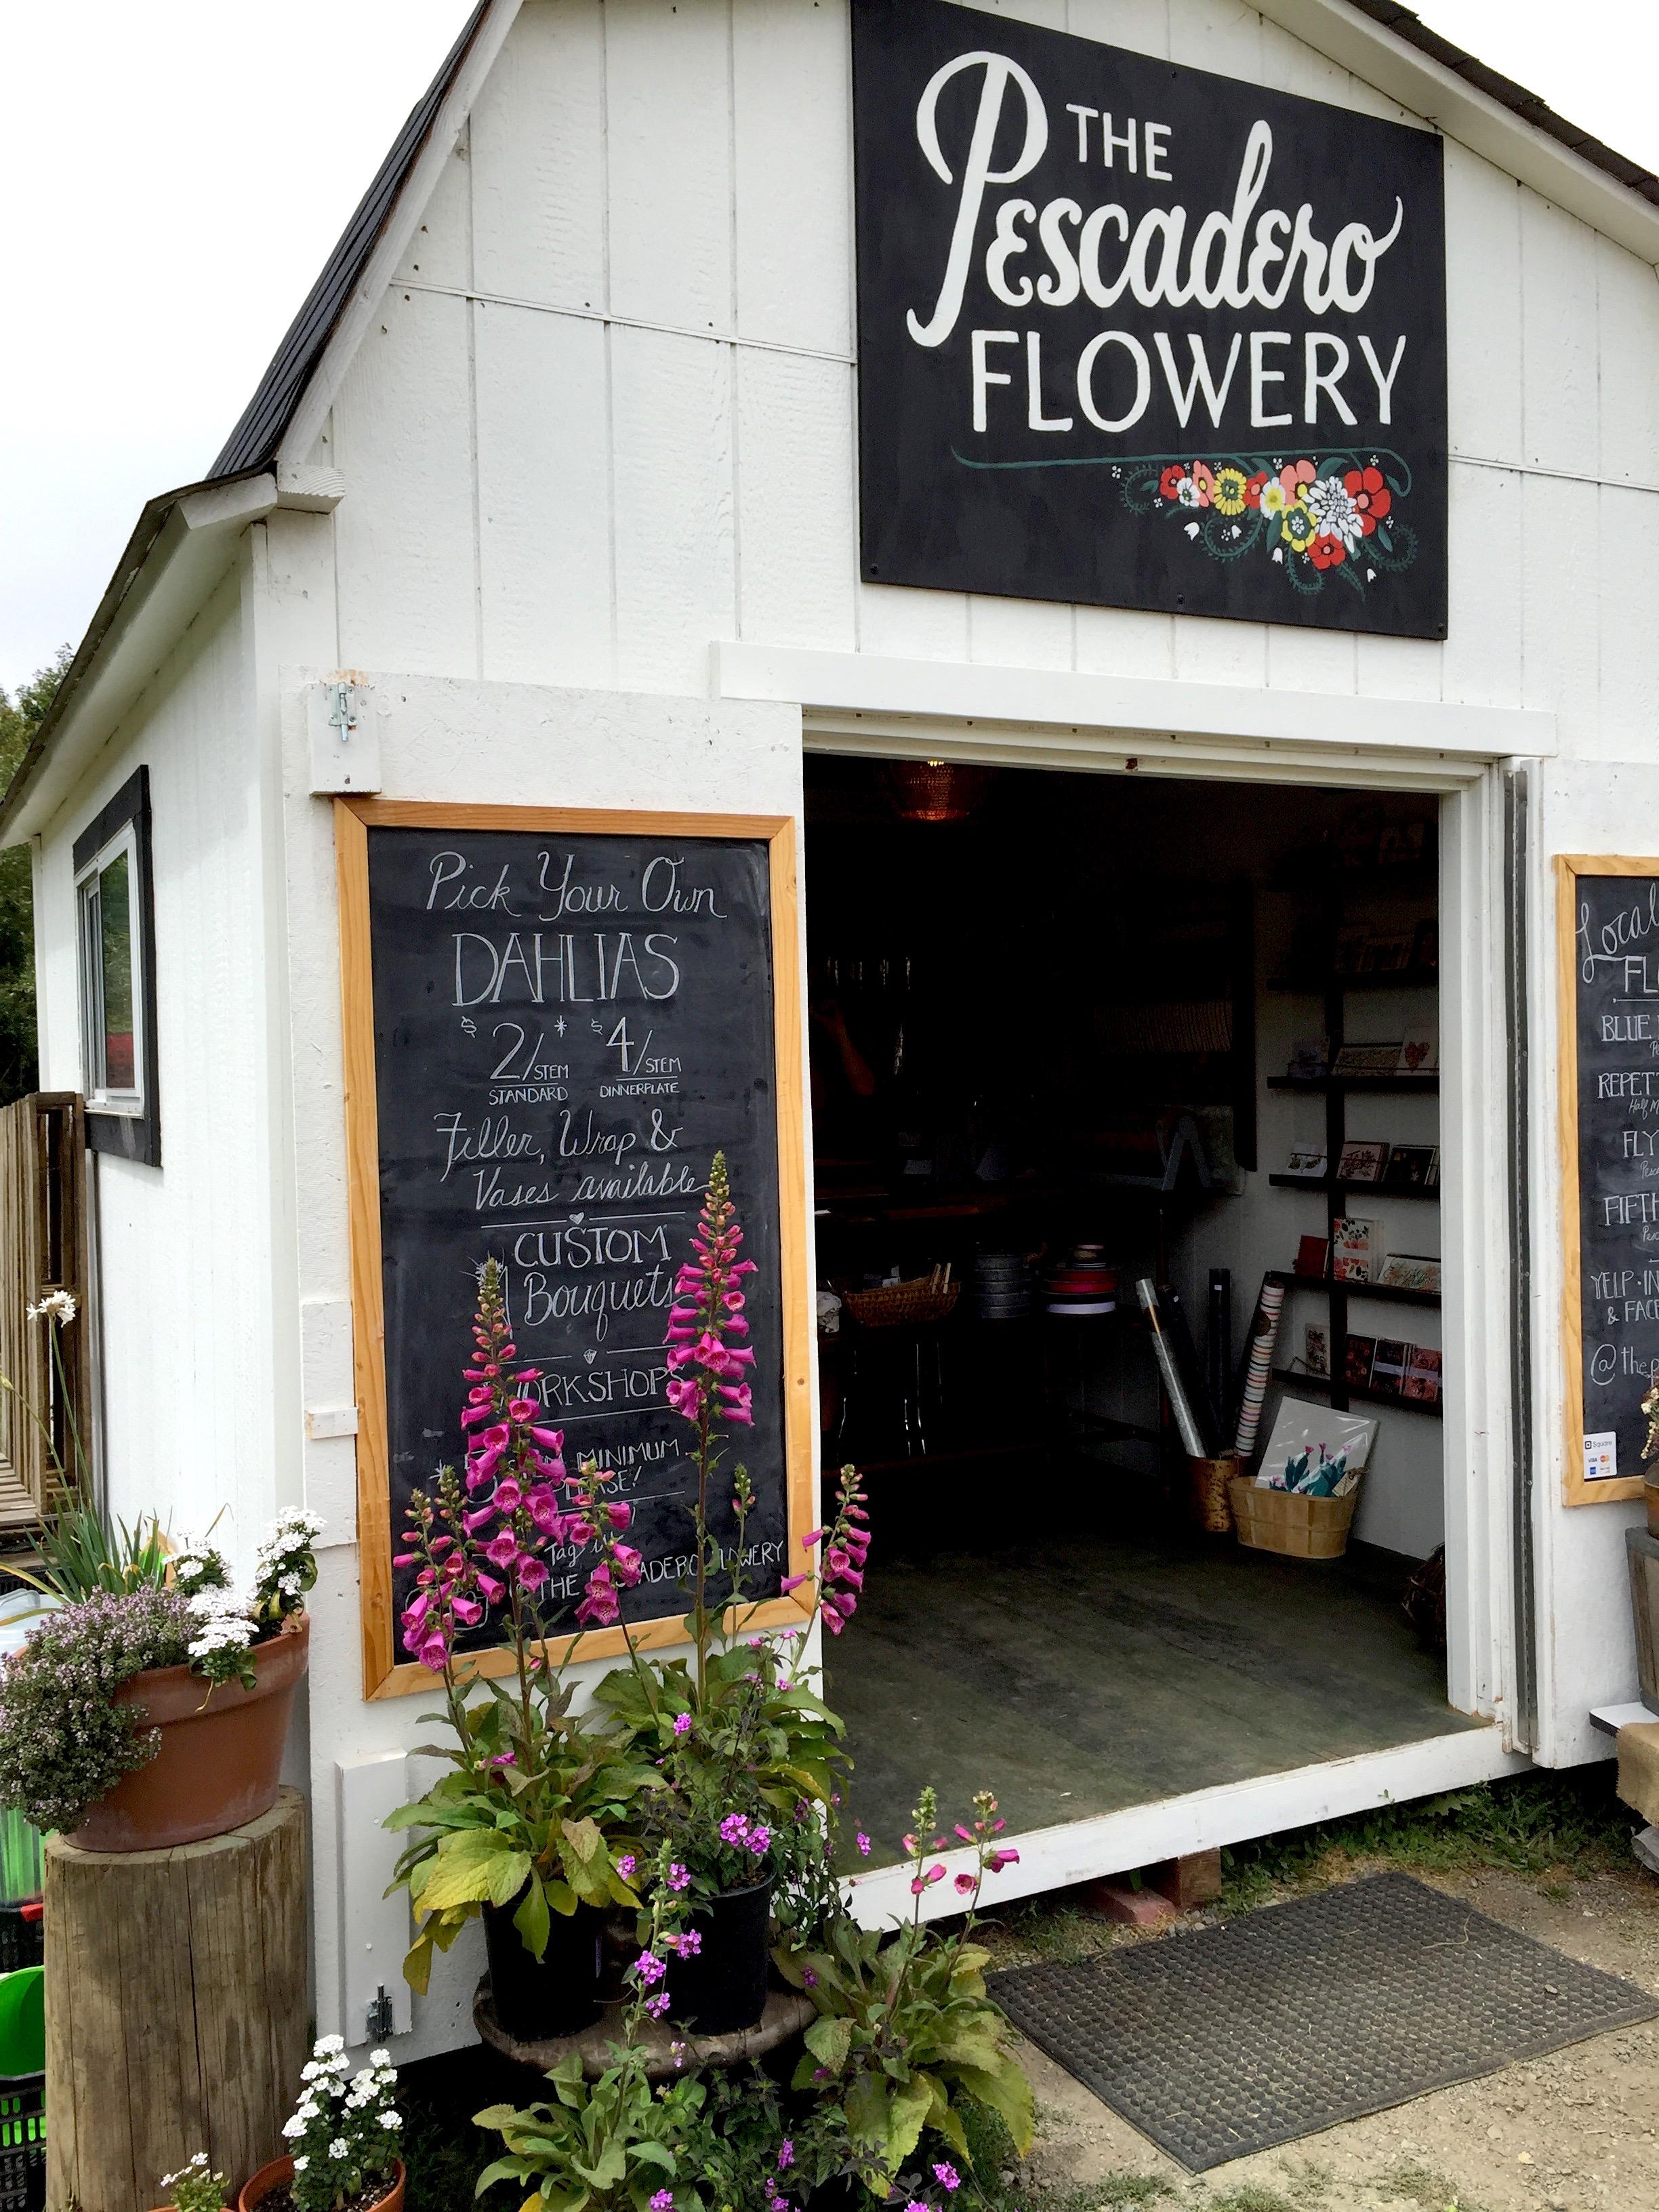 The Pescadero Flowery: U-Pick Dahlia farm + floral workshops